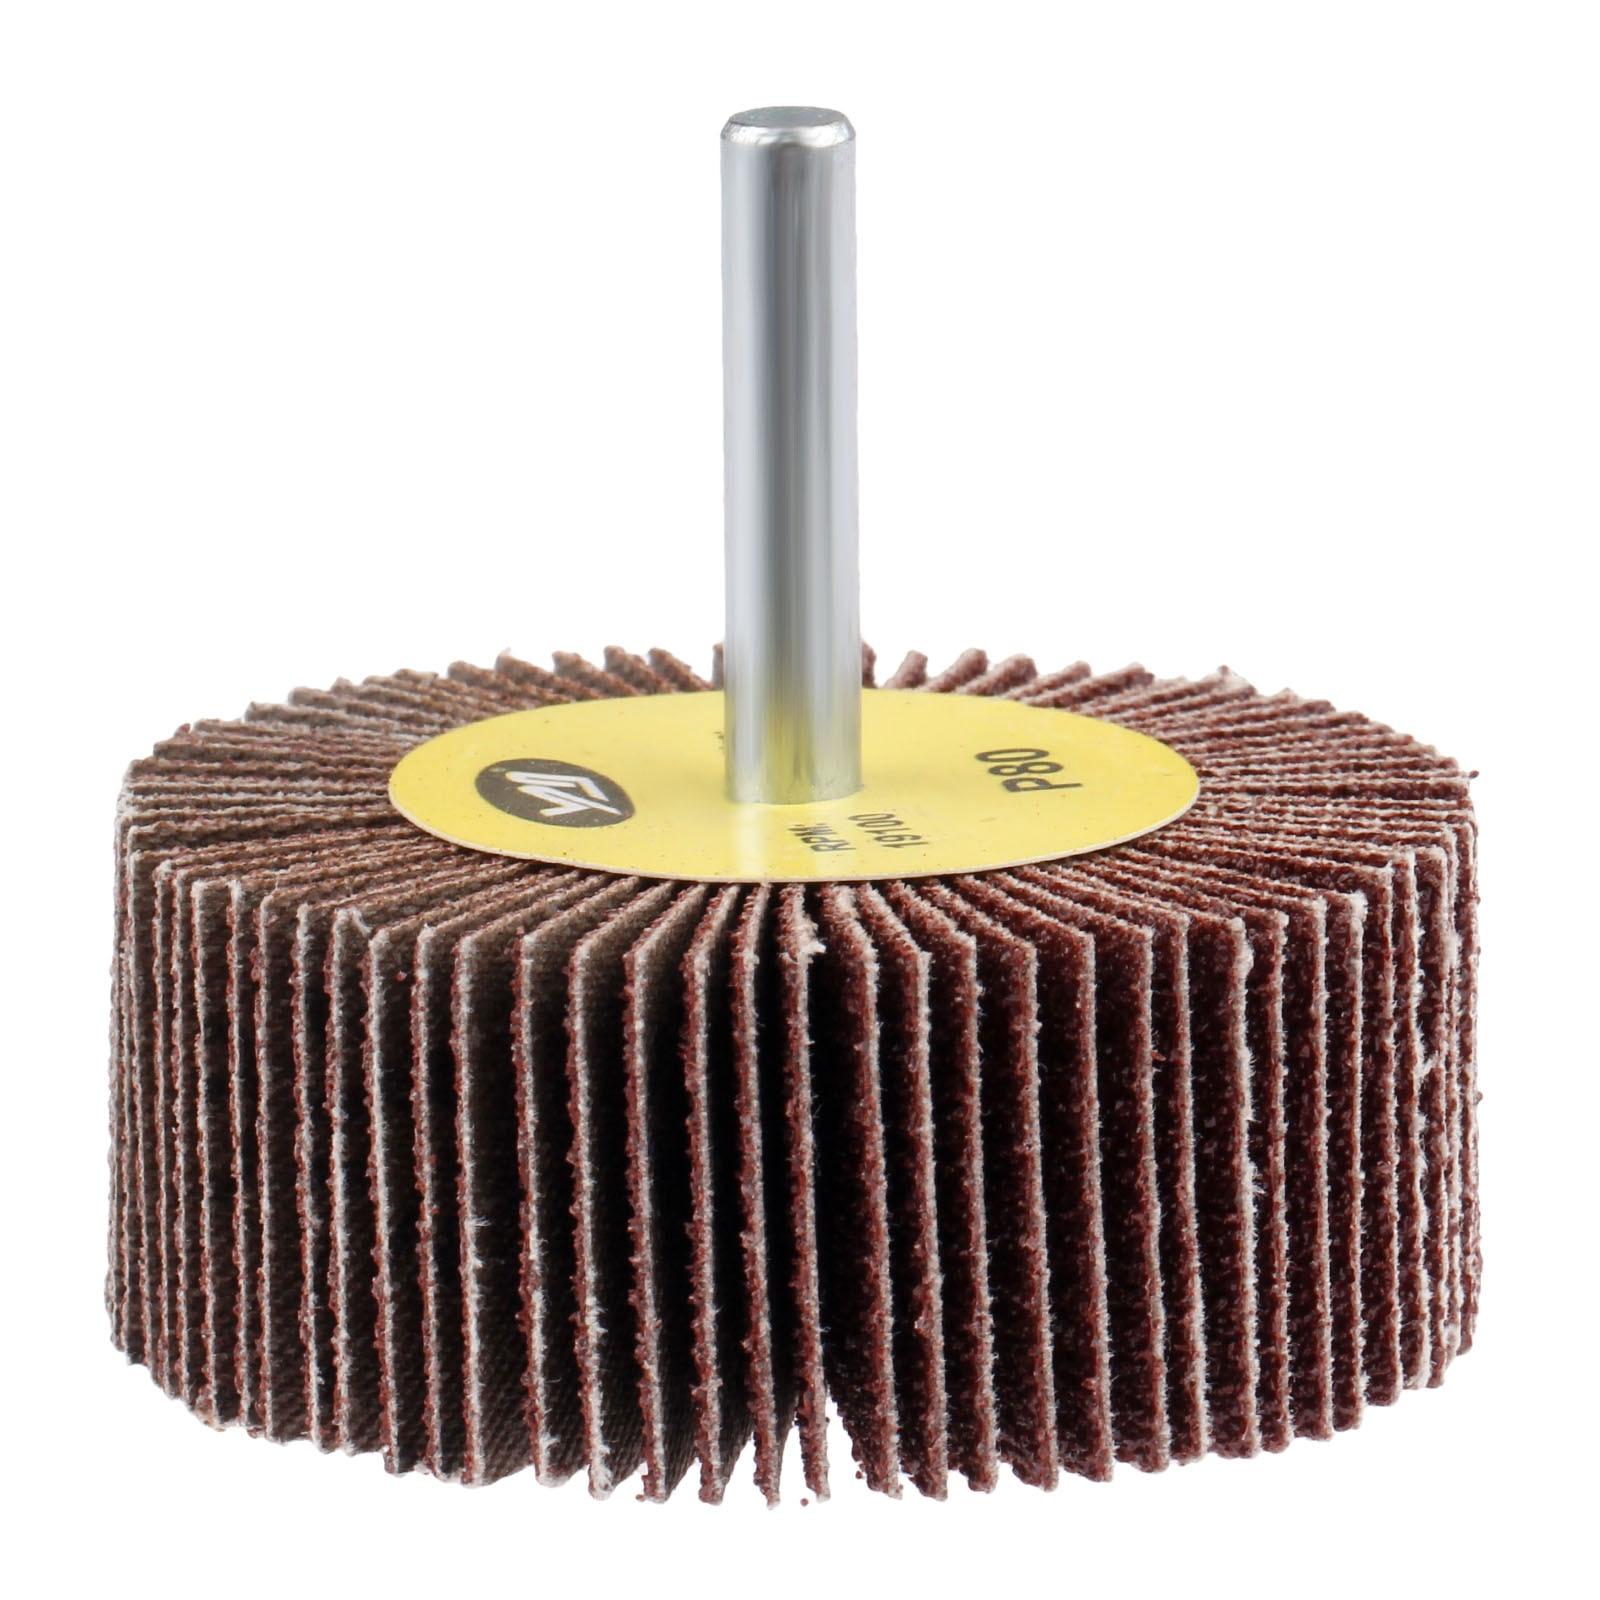 DRELD 1Pc 80-Grit 60mm Sanding Flap Wheels Buffing Grinding Flap Wheels Brush Sandpaper For Rotary Tools Dremel Accessories